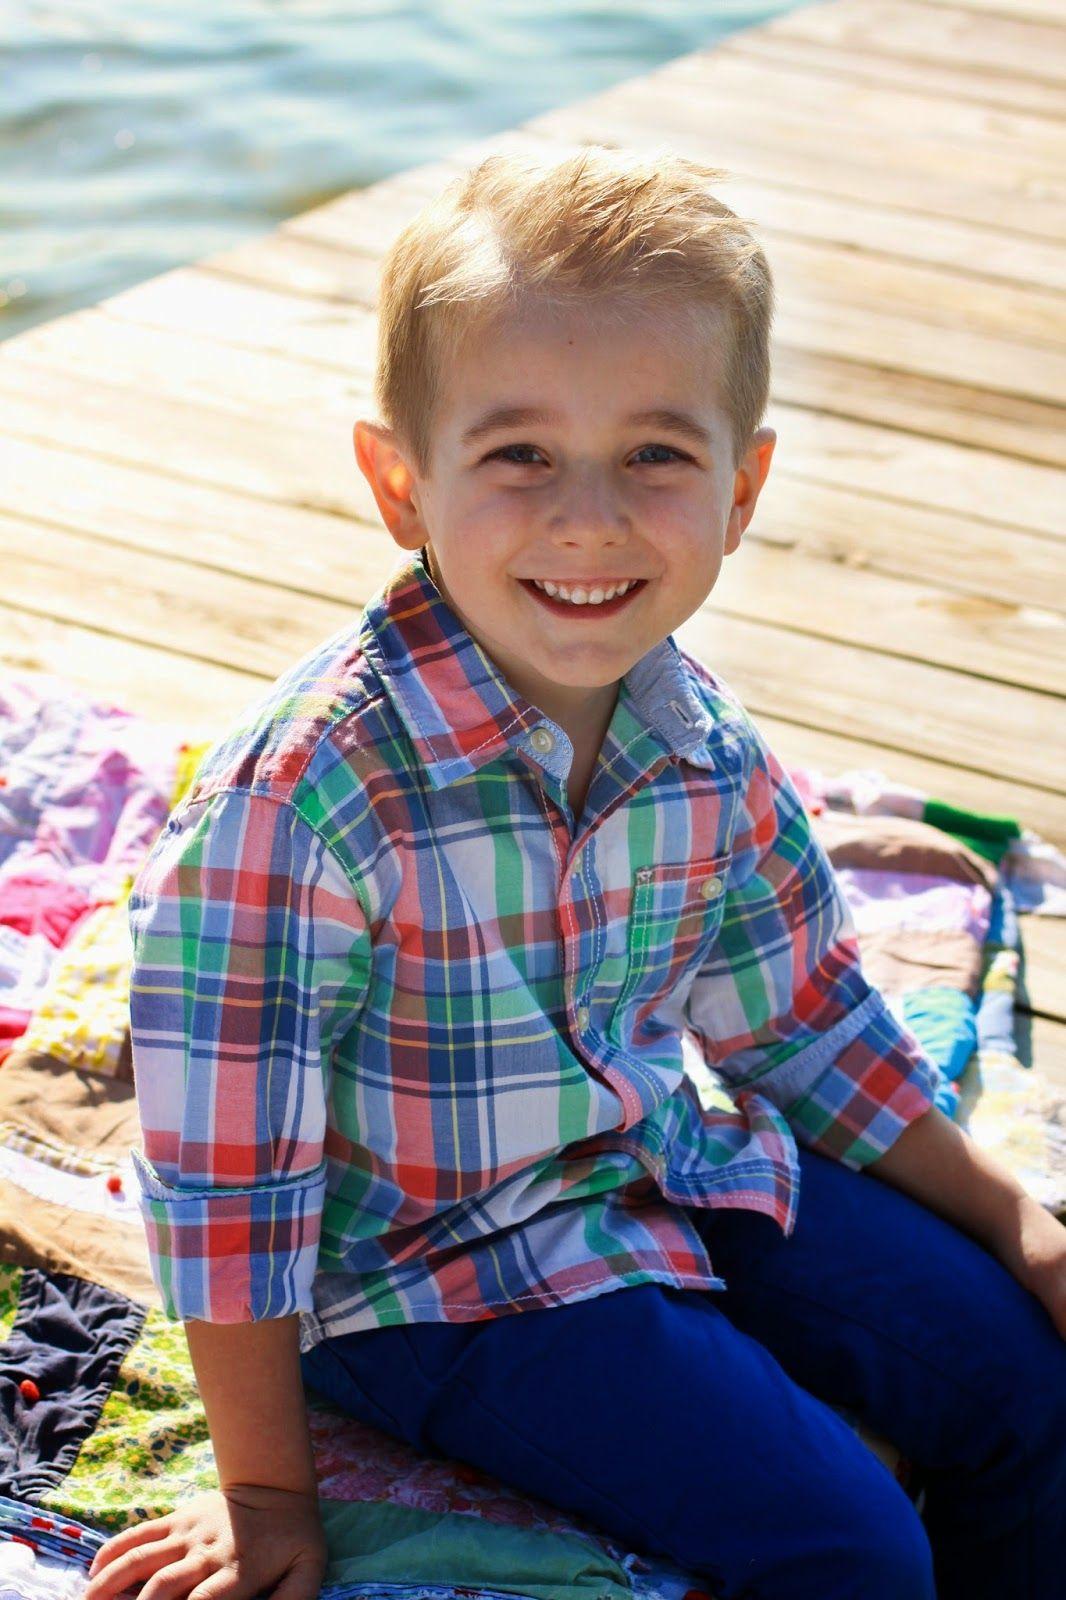 Kyes 5 year old photos boy photo shoot boy photos old